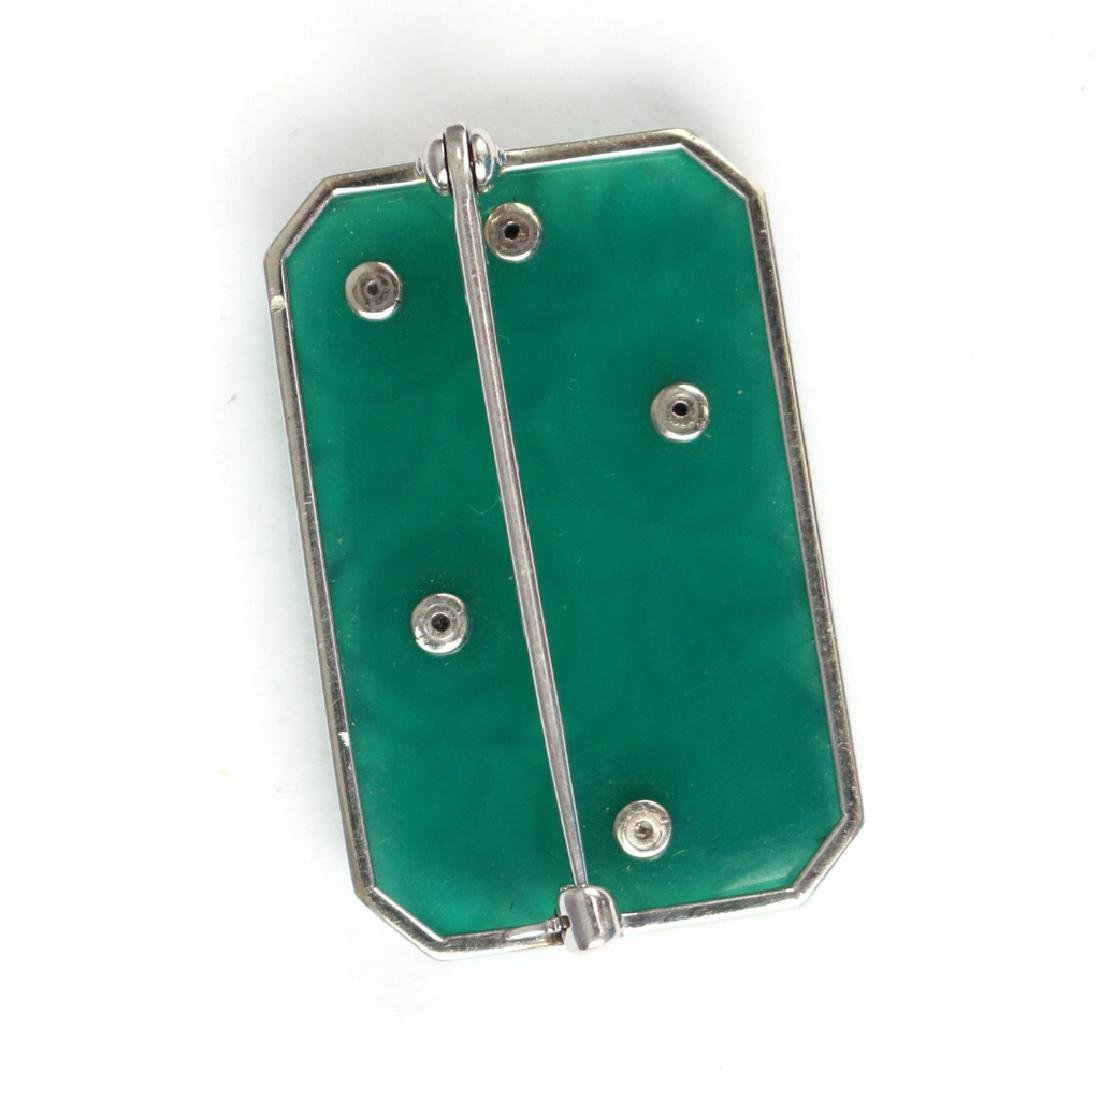 PLIQUE-A-JOUR & DIAMOND PIN - 3